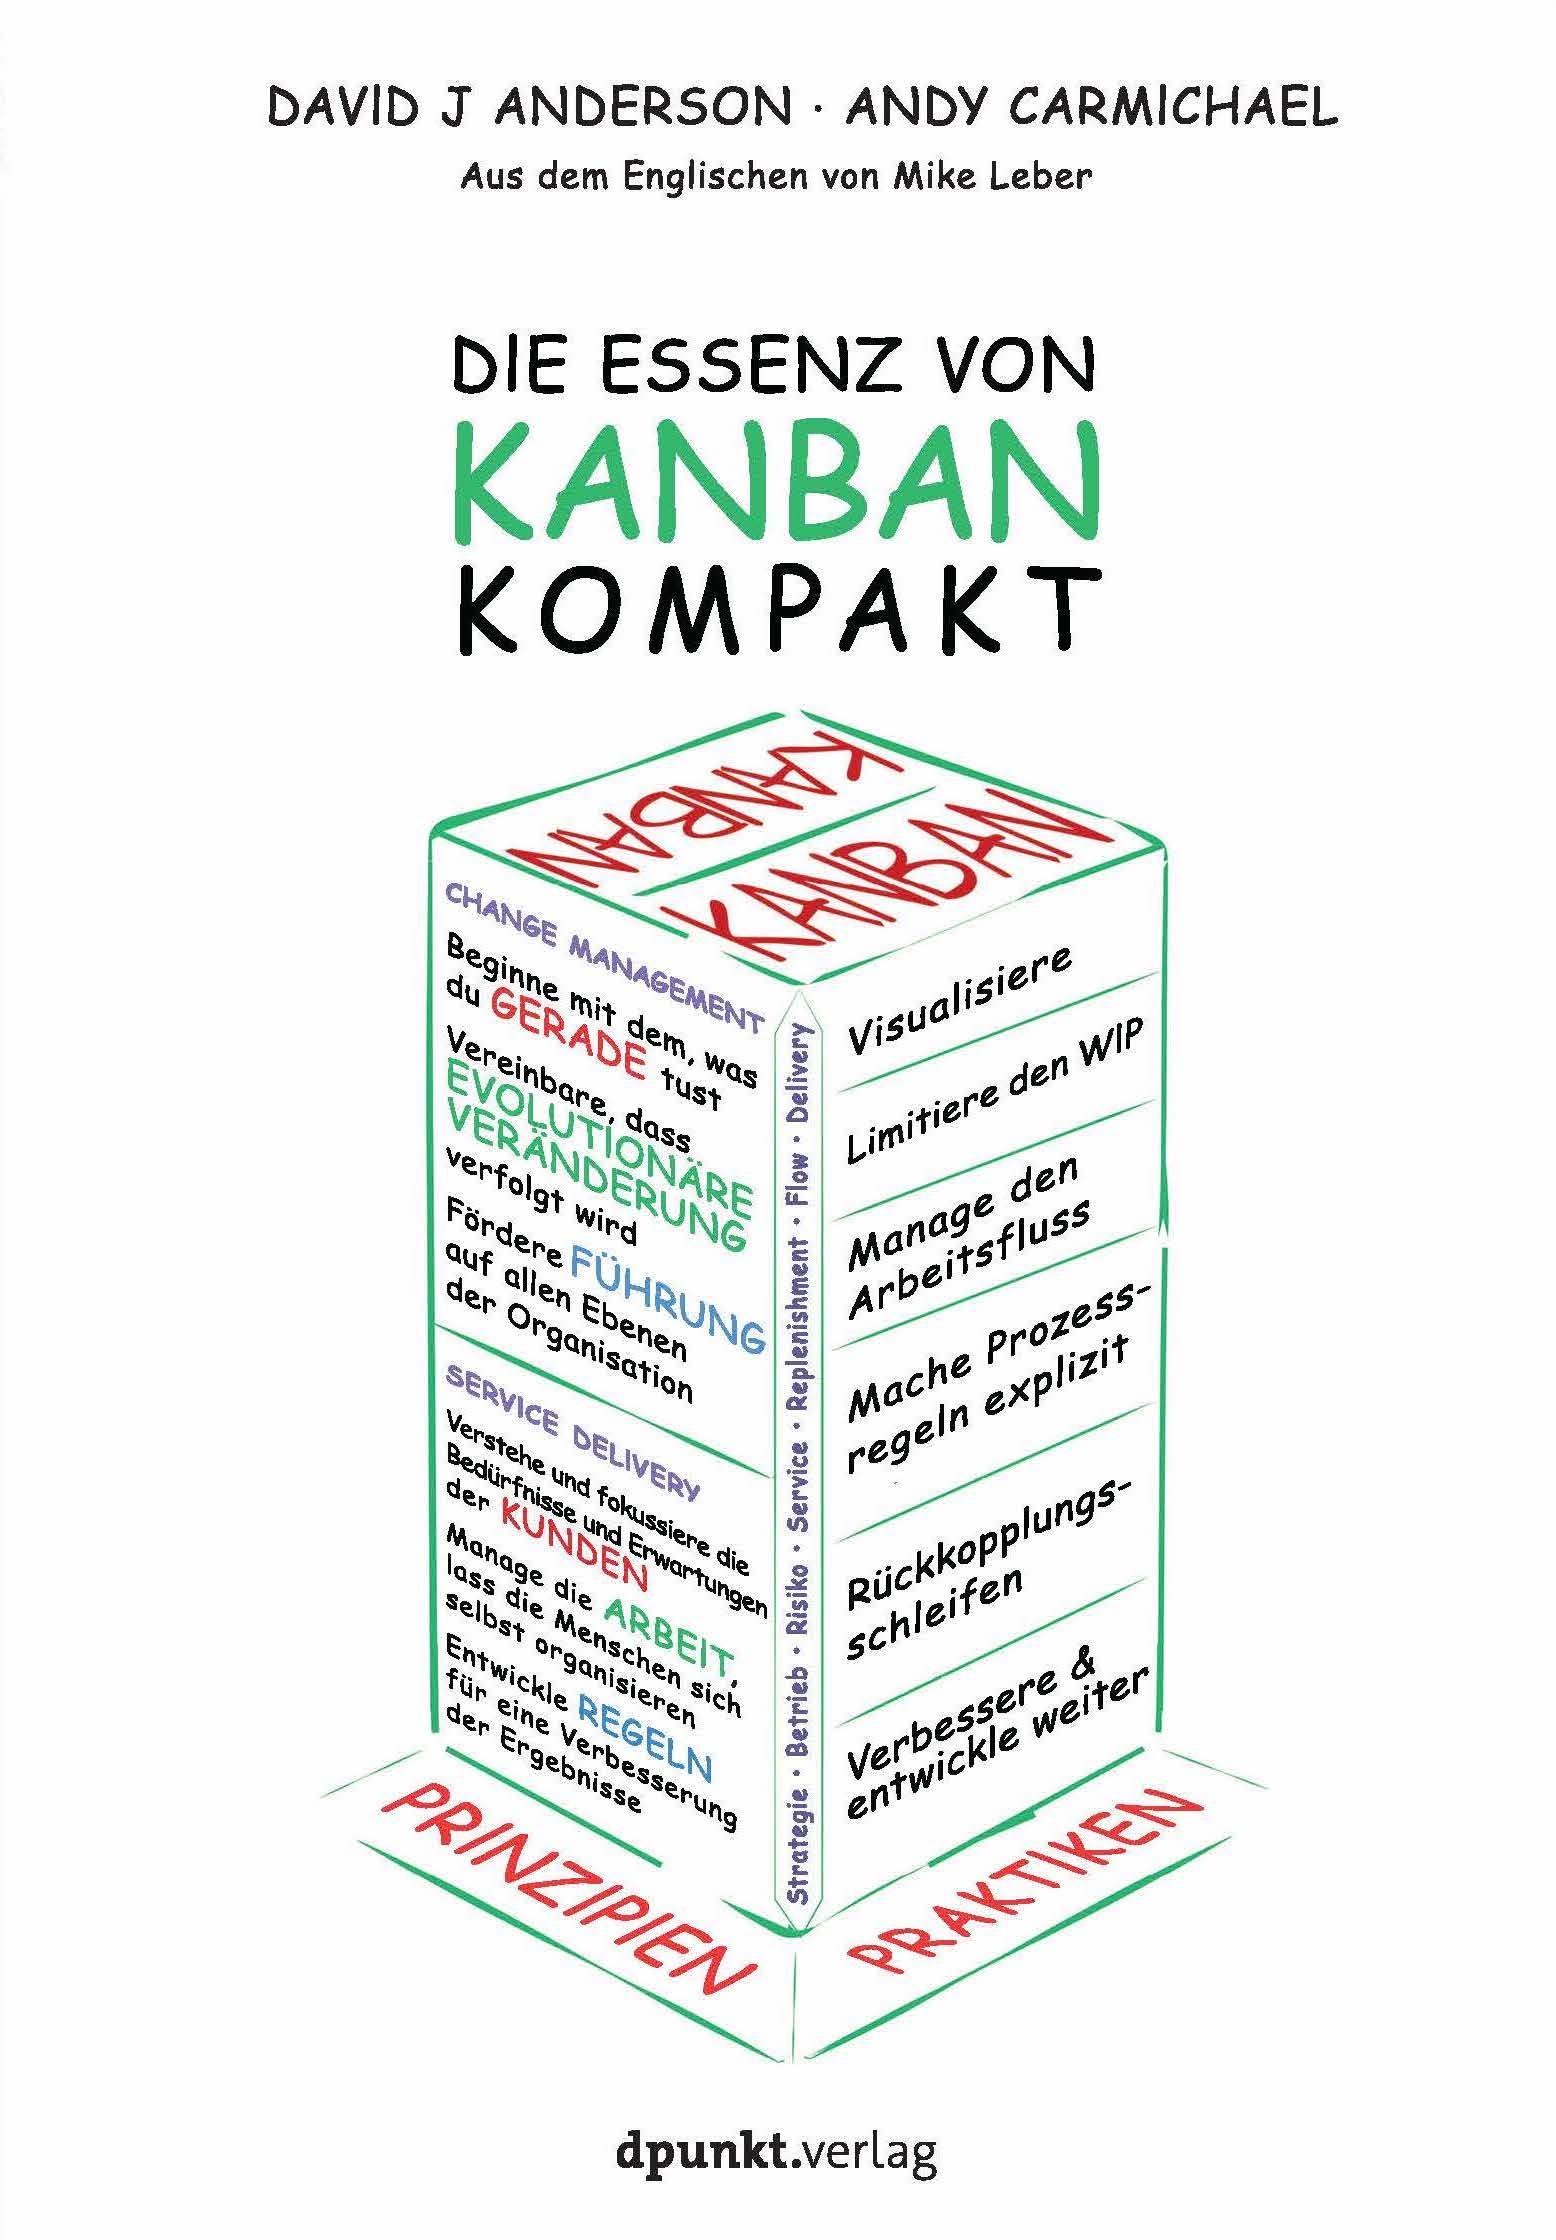 Book Cover Anderson_Carmichael_Kanban_mit U1-DLVersion